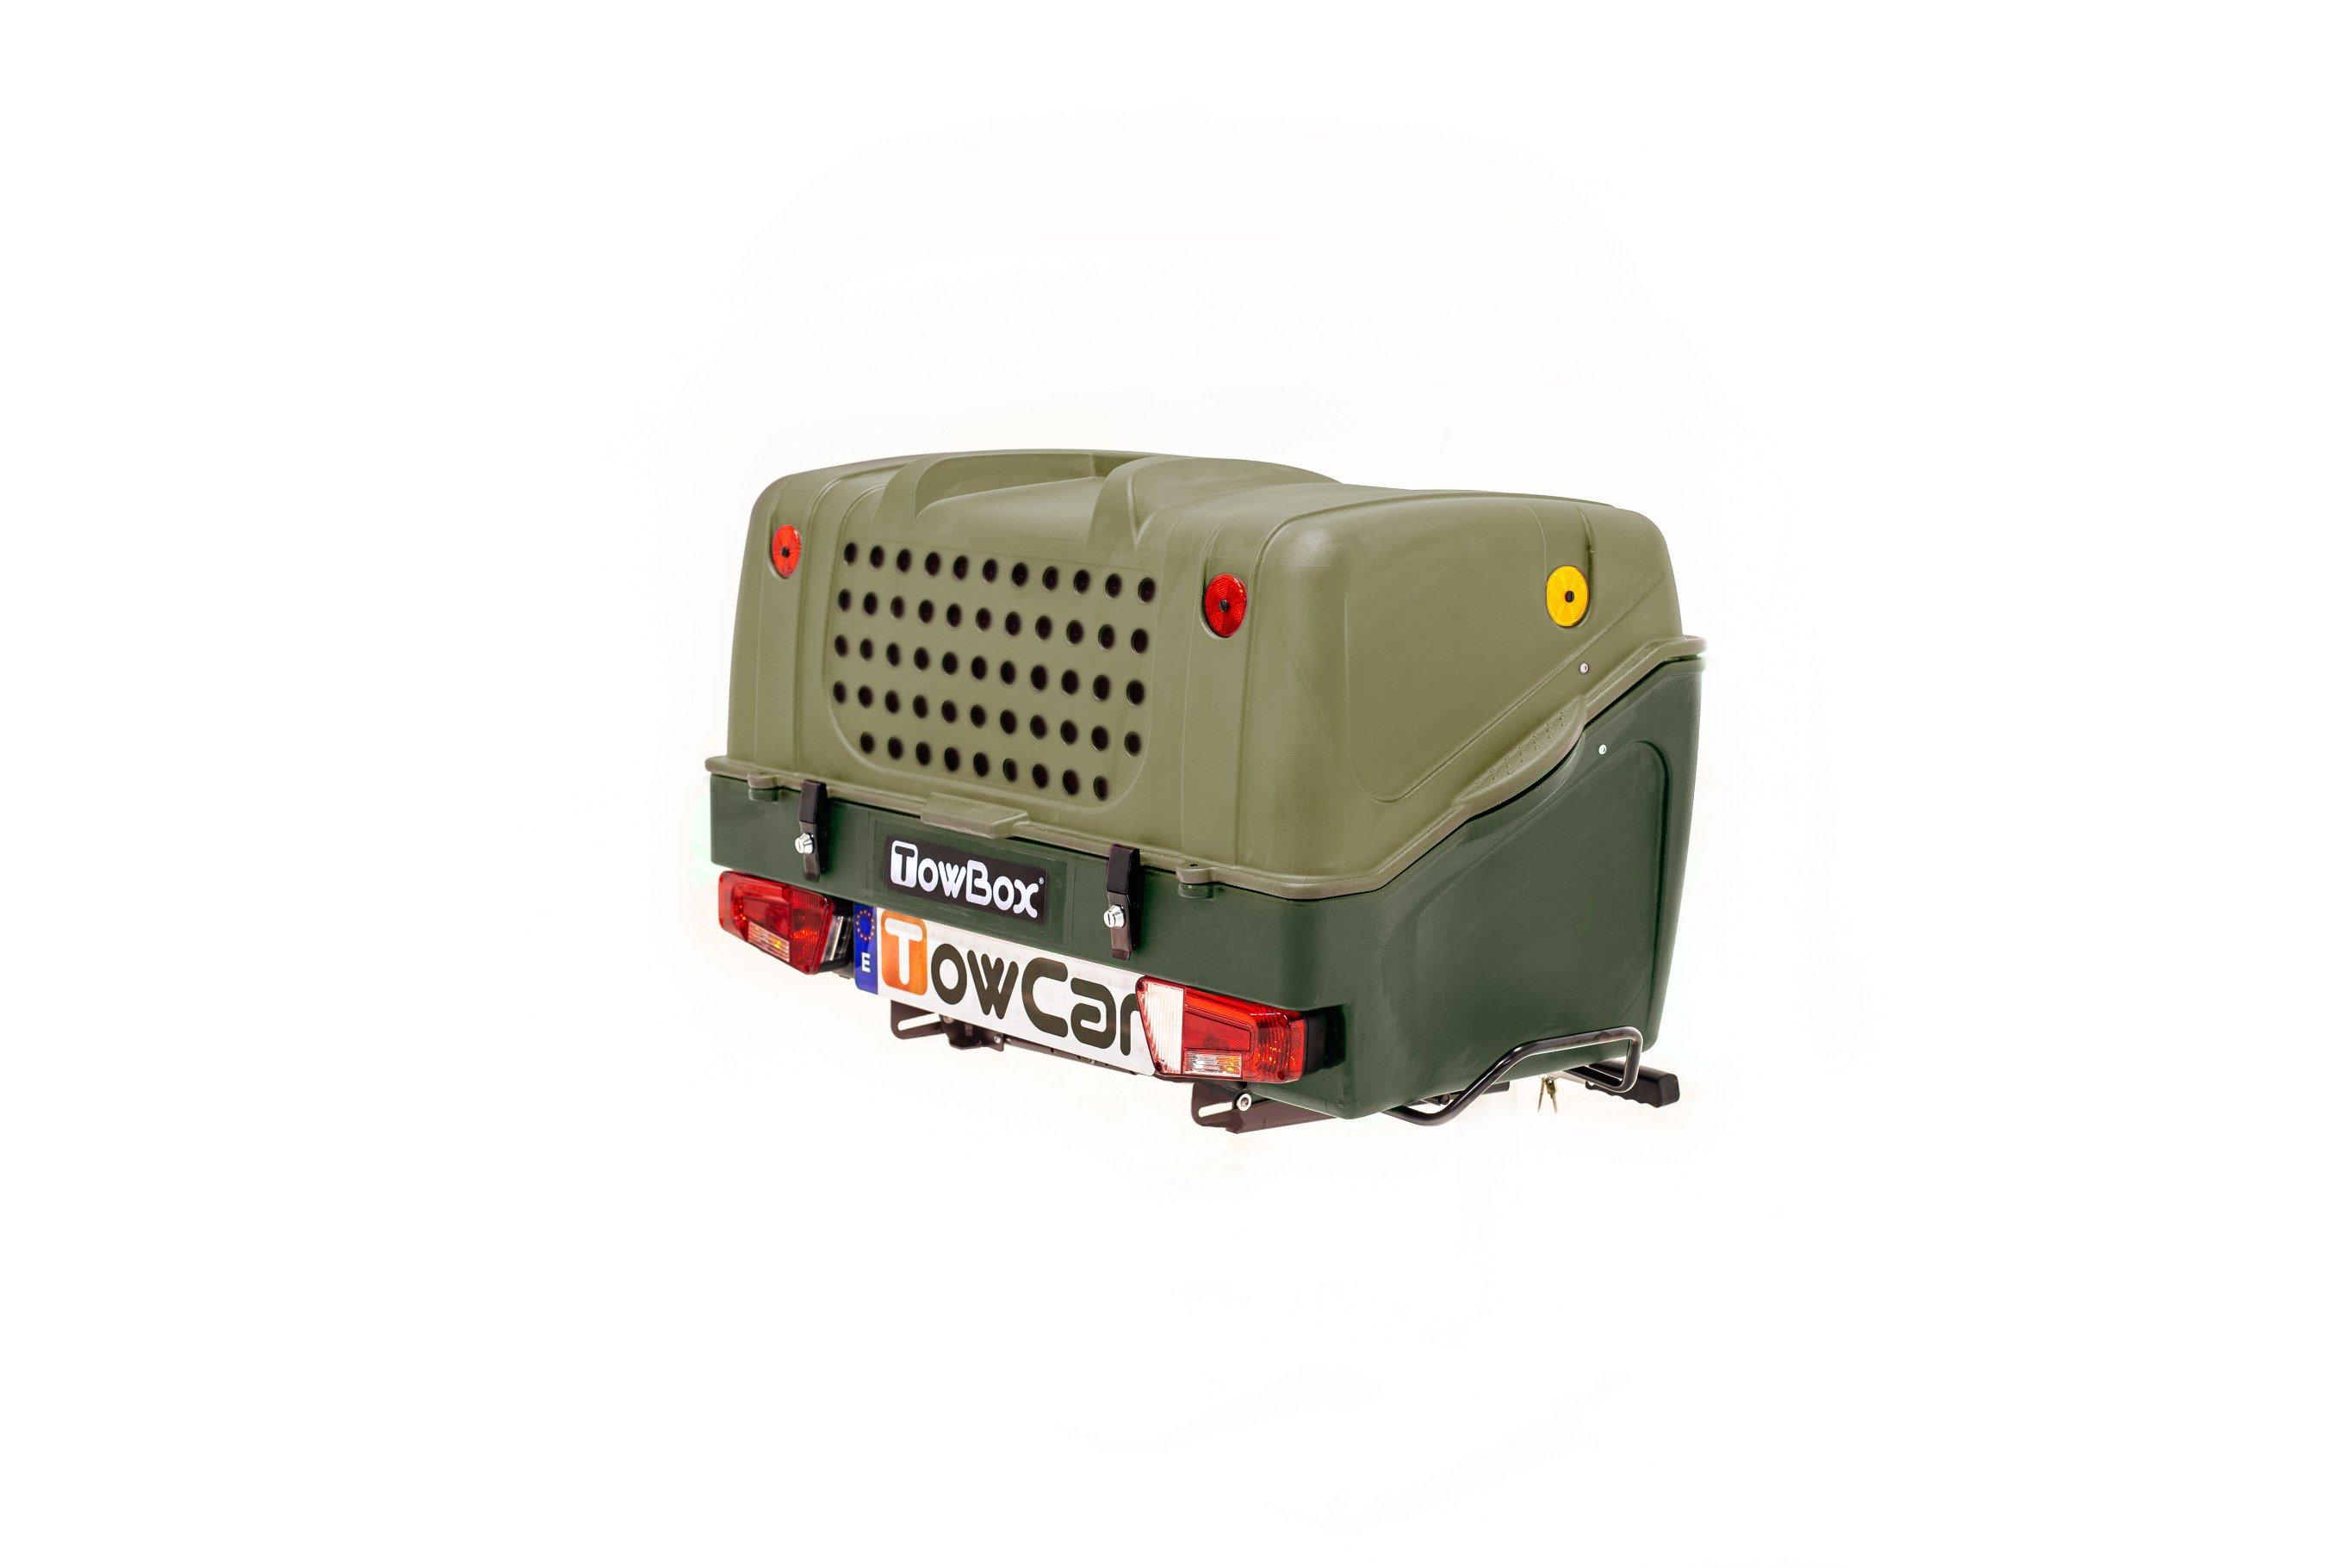 Towbox V1 dog verde